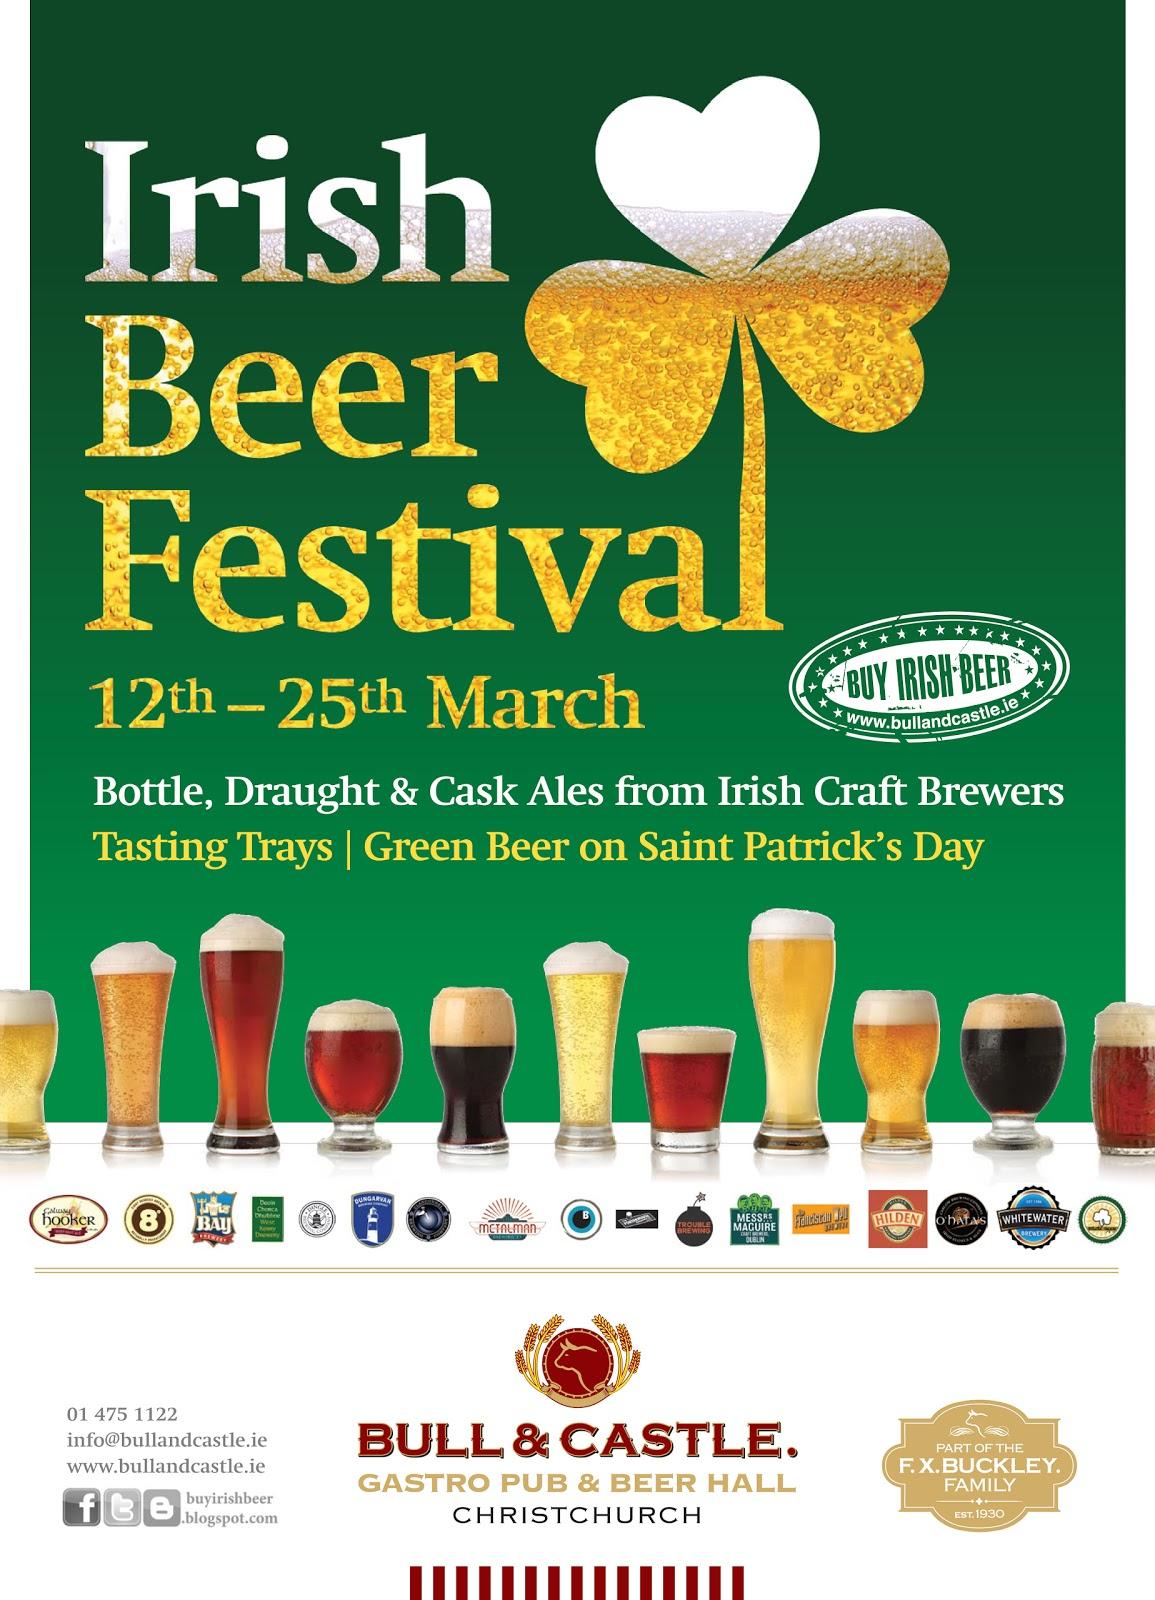 Irish Beer FestivalIrish Beer